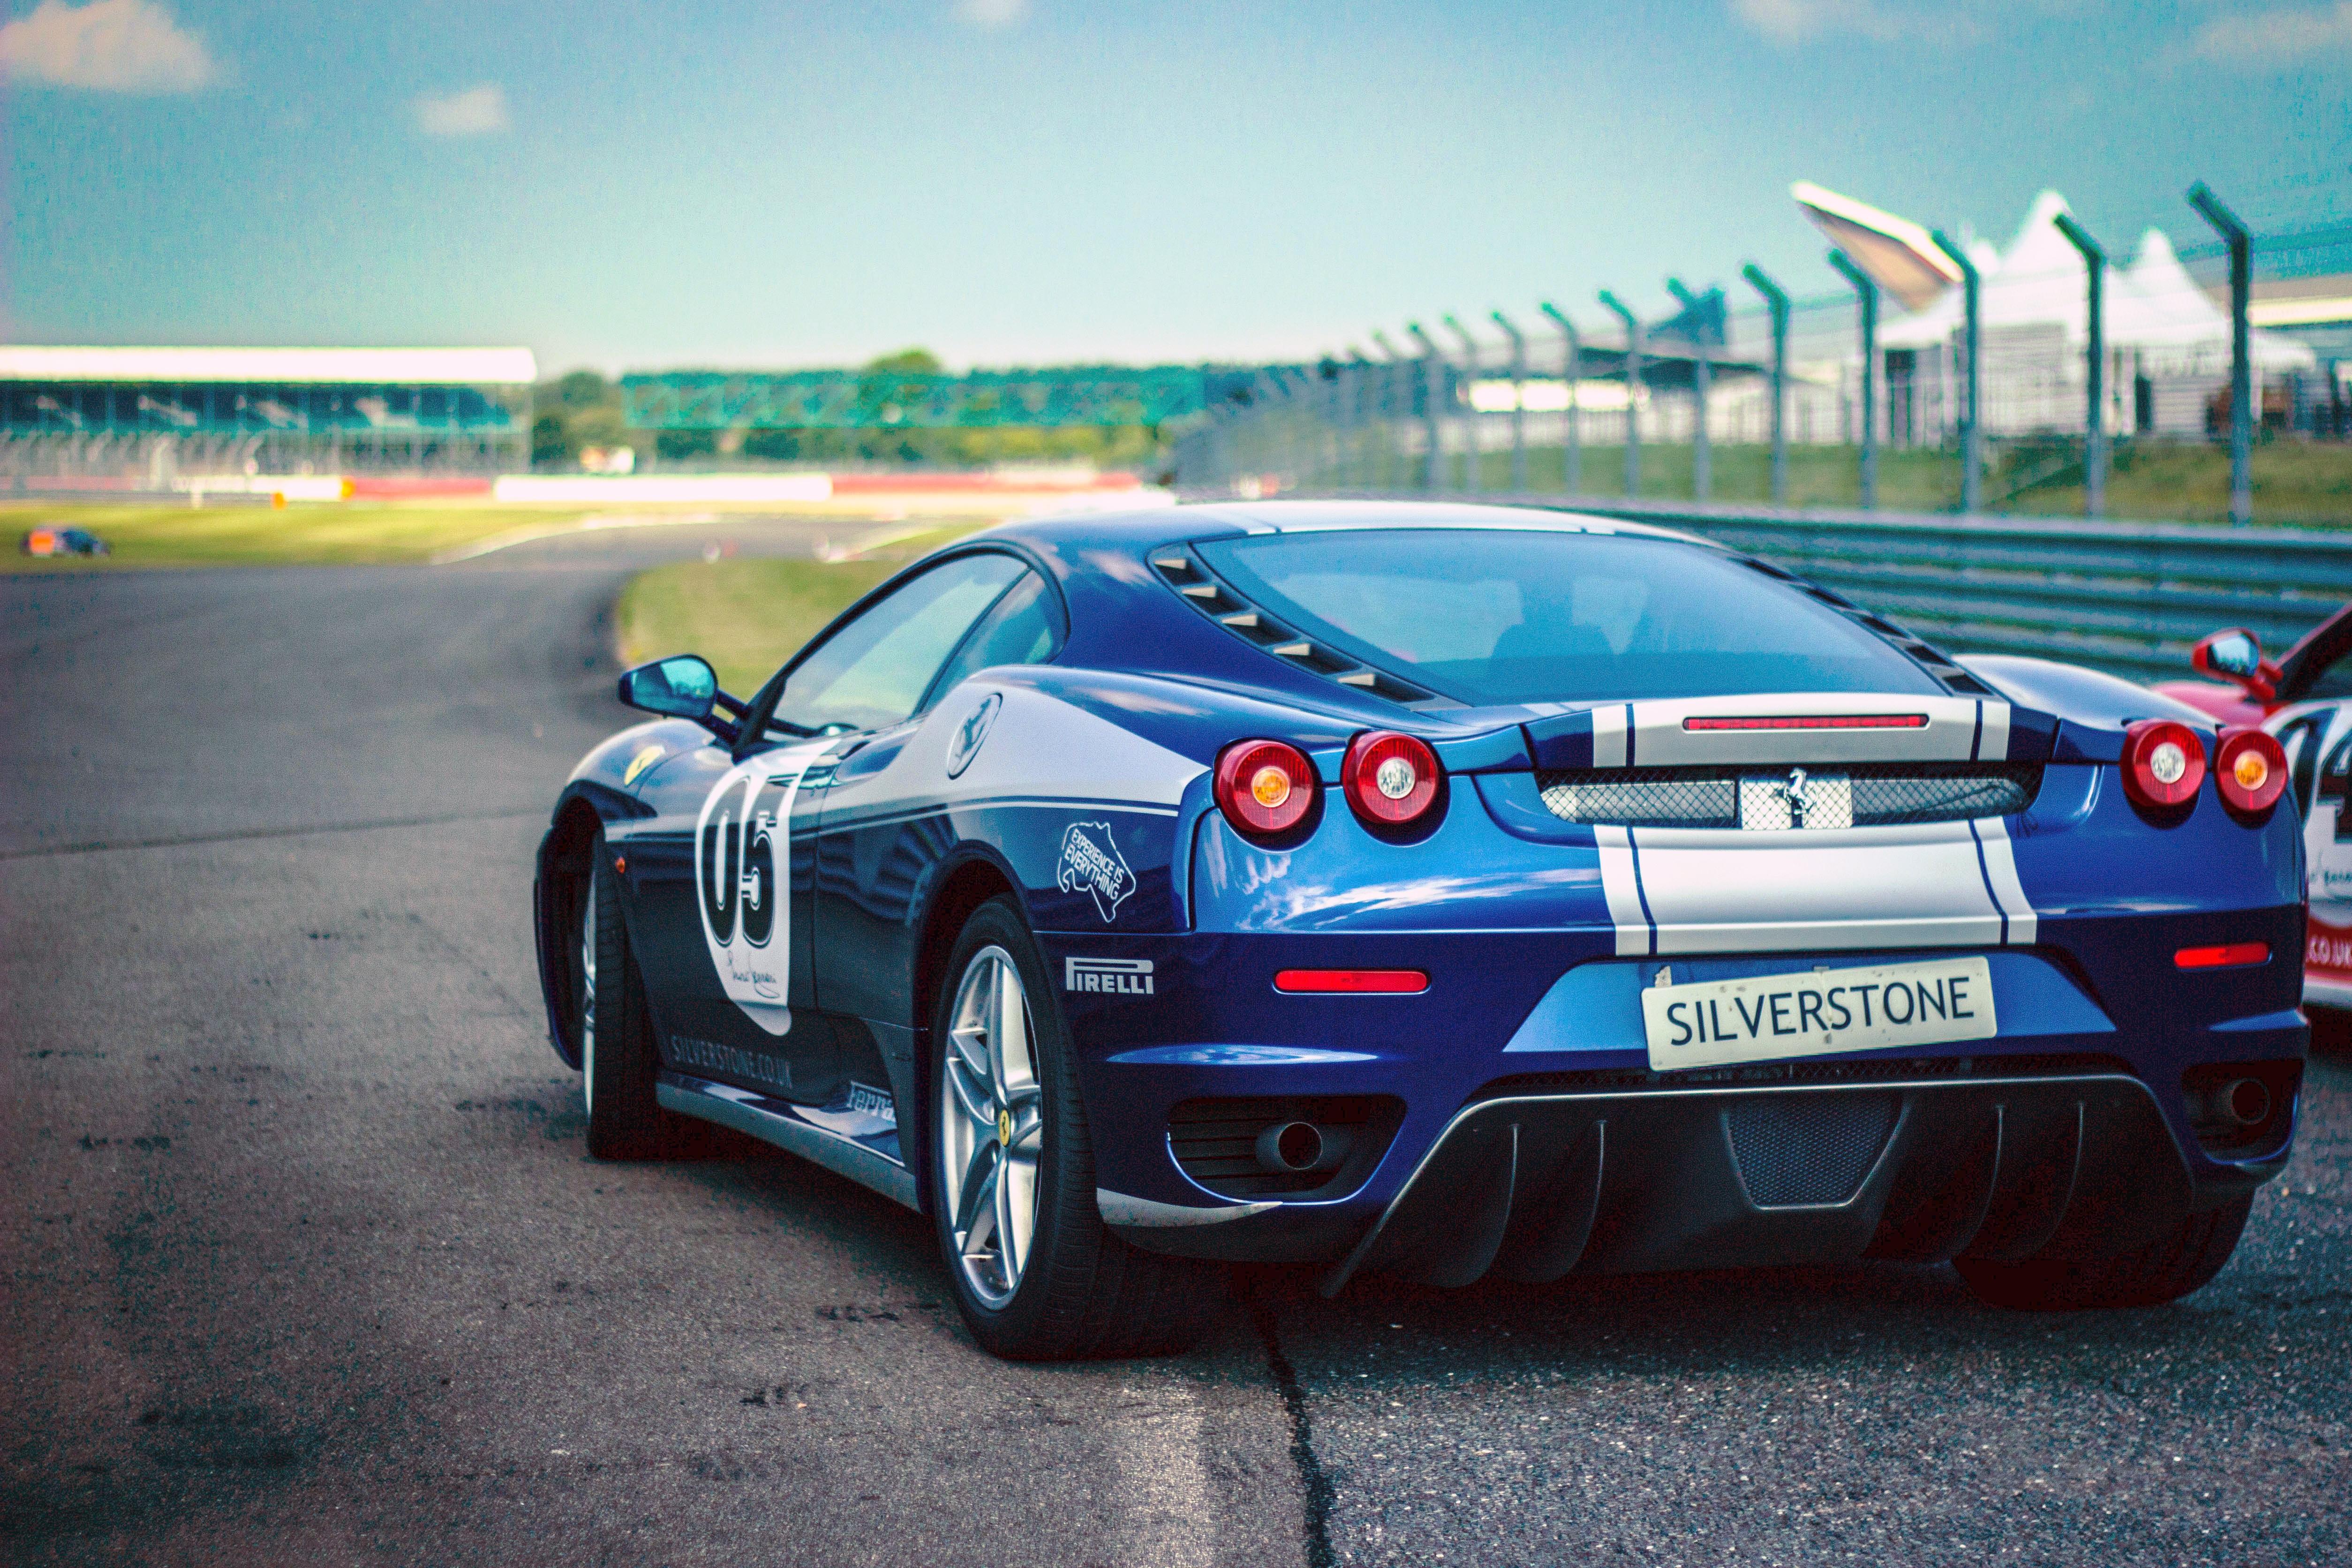 exterior-detailing-horsepower-uae